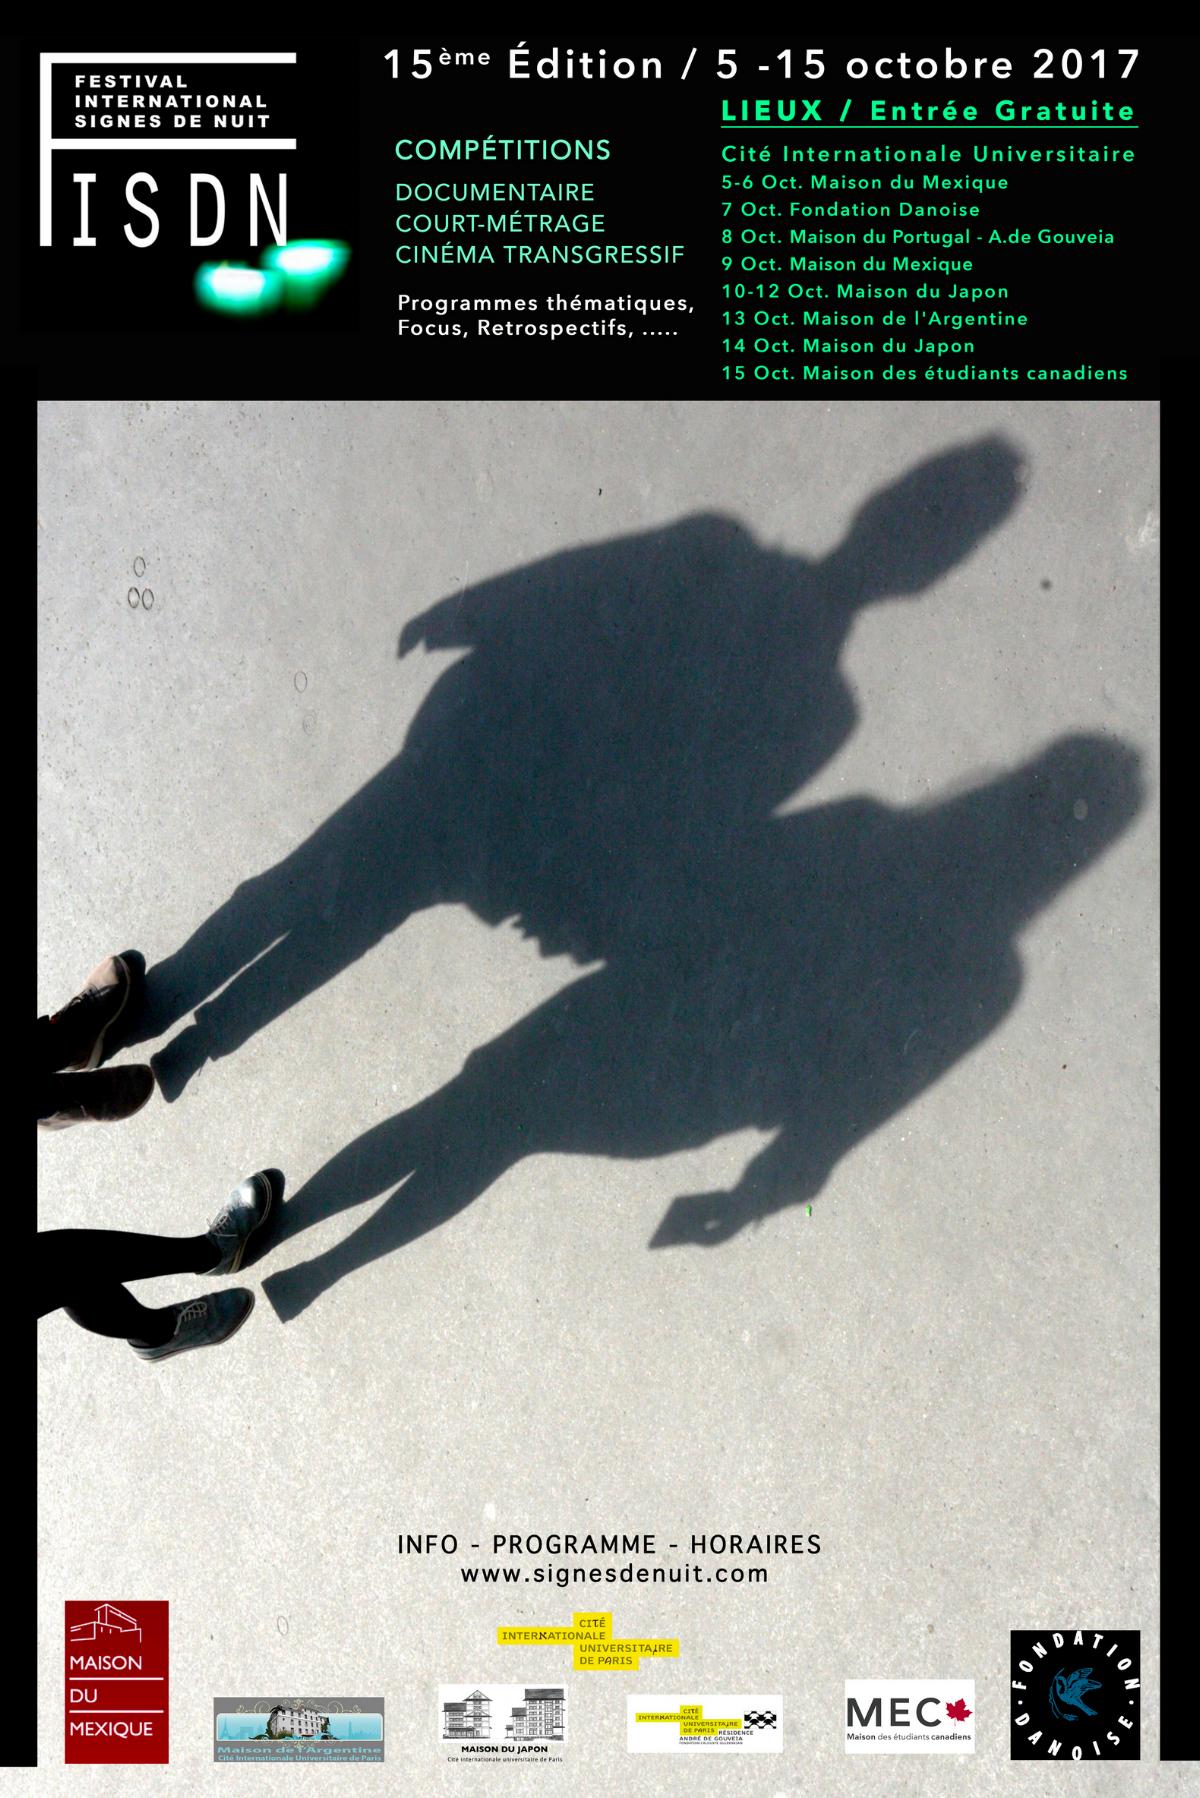 The Land Within  is an Official Selection in  Festival International Signes De Nuit ,  Paris, France.   Screening: October 9, 2017, 22:00 hr,  Maison du Mexique , Program - Transgressive Cinema #2  For full program:  http://www.signesdenuit.com/